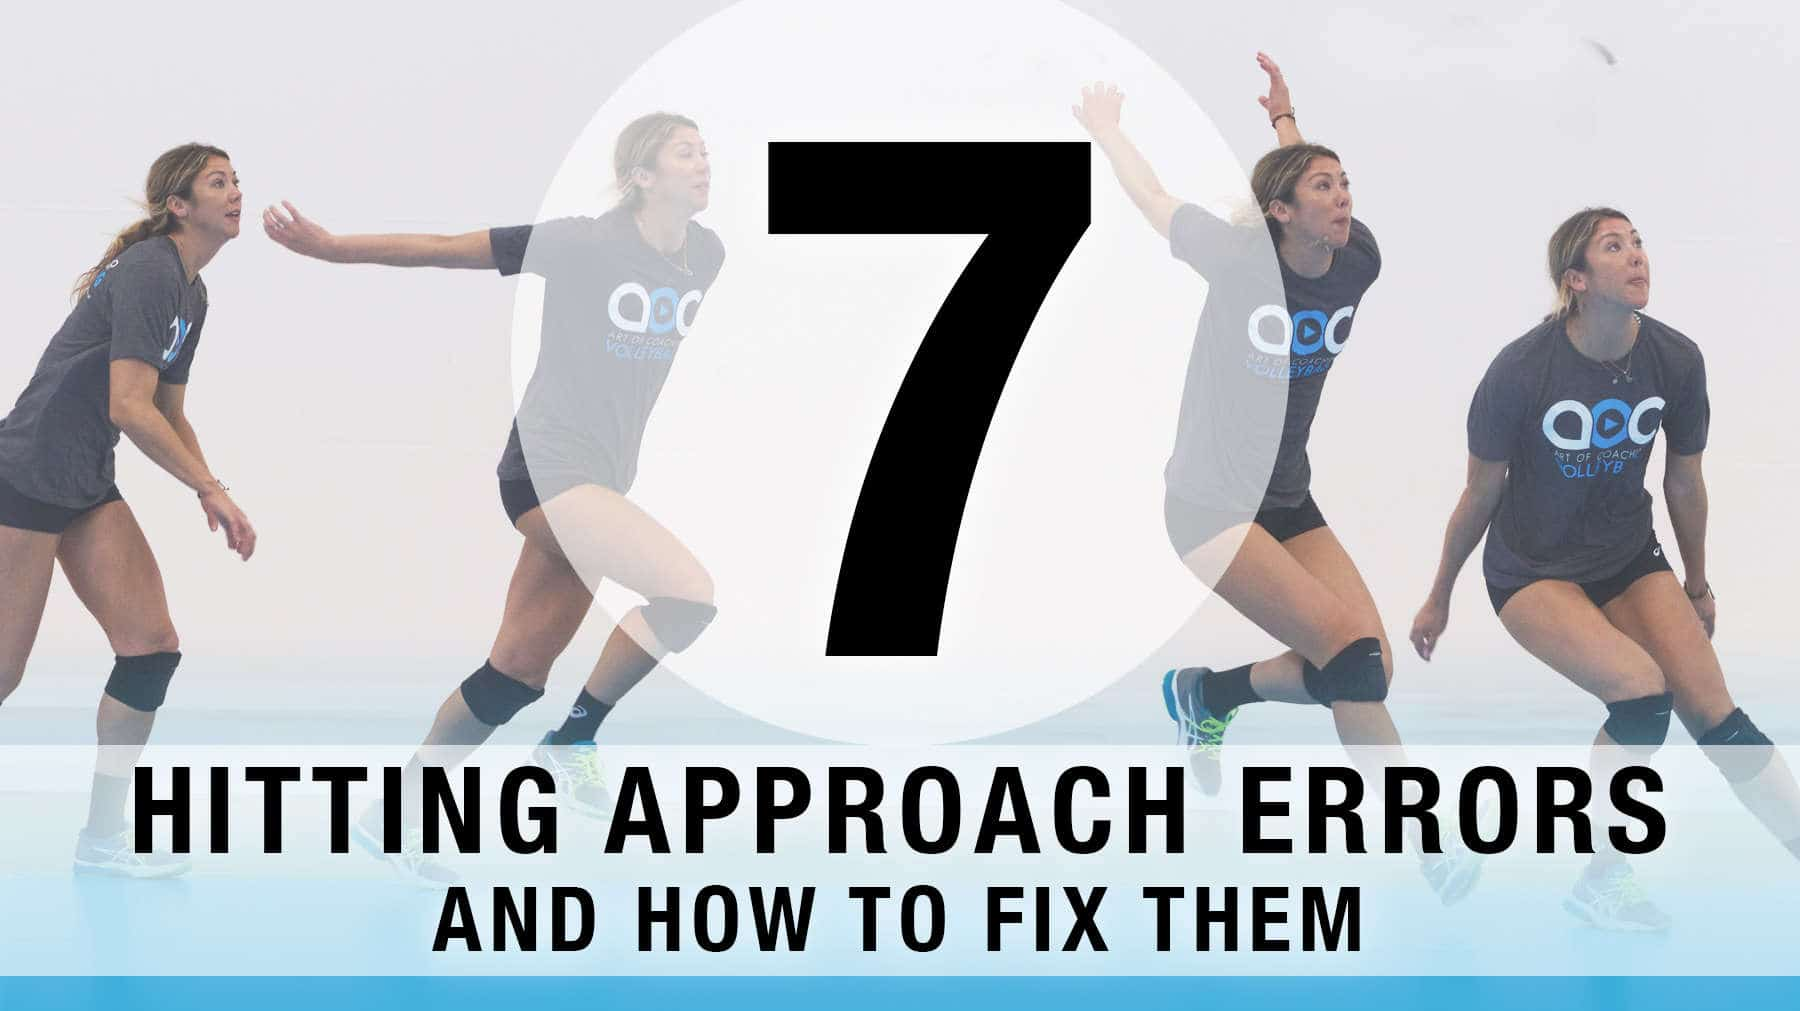 Hitting approach errors